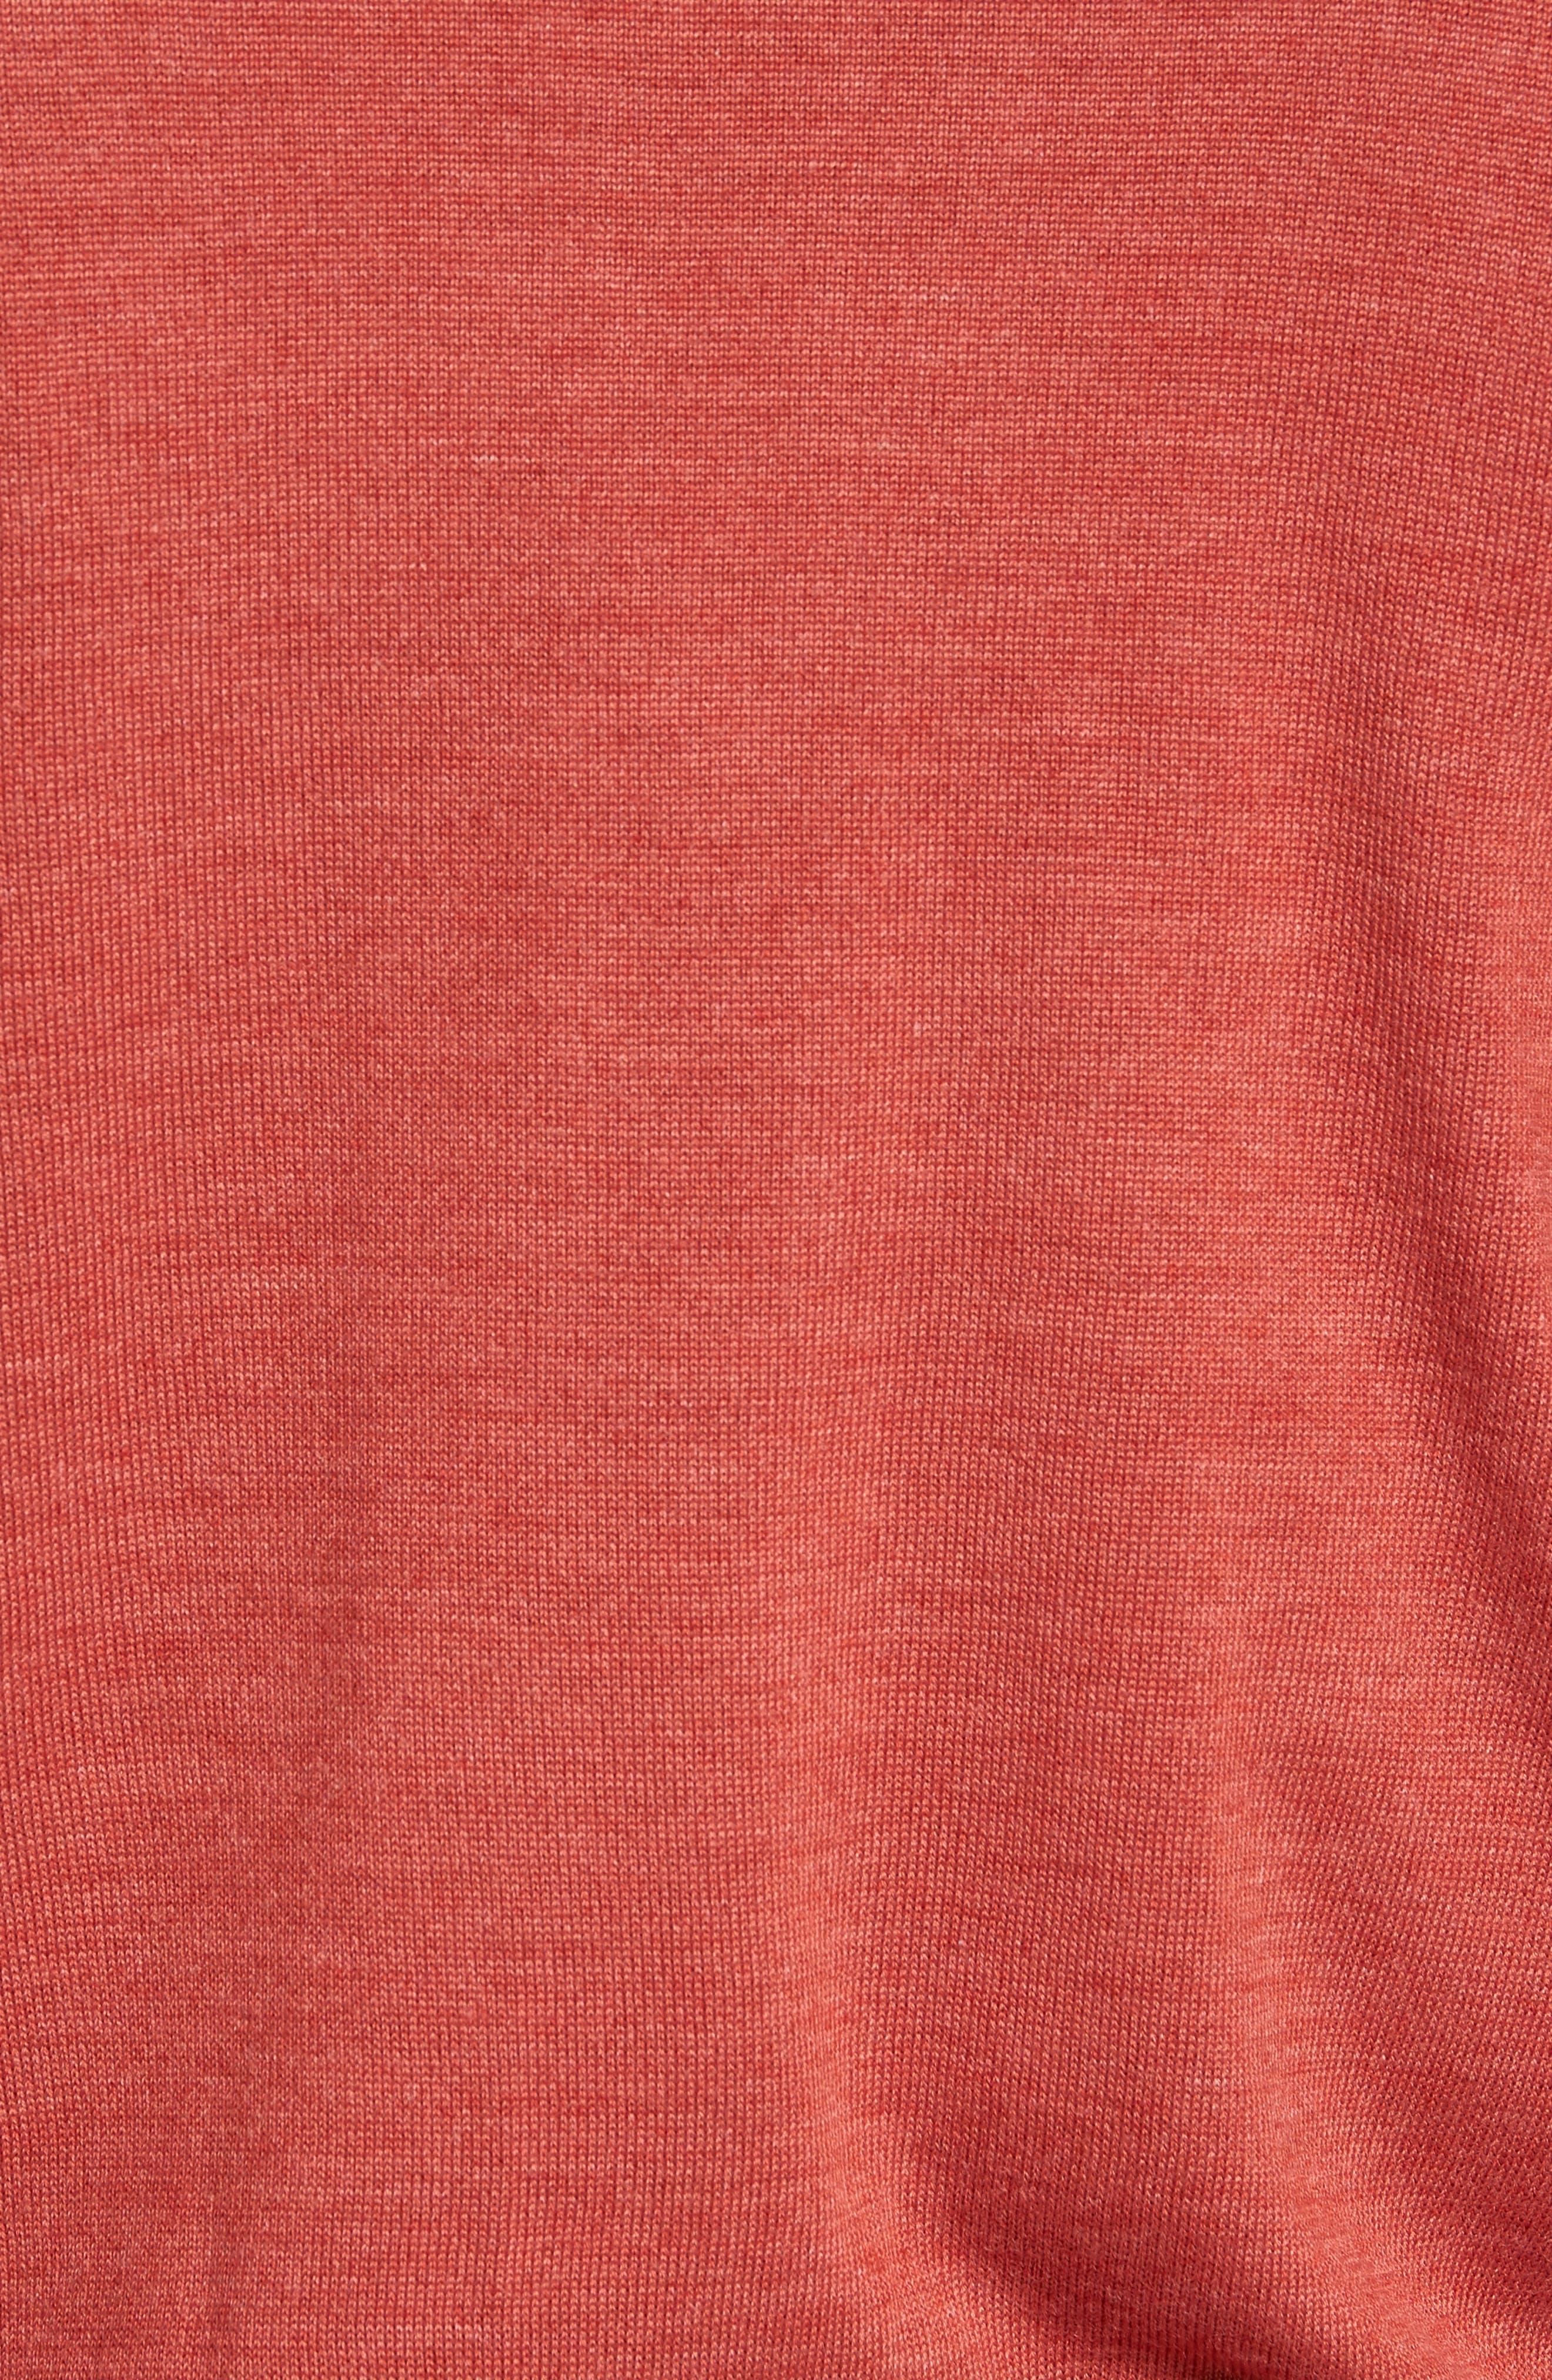 Douglas Quarter Zip Wool Blend Sweater,                             Alternate thumbnail 5, color,                             600